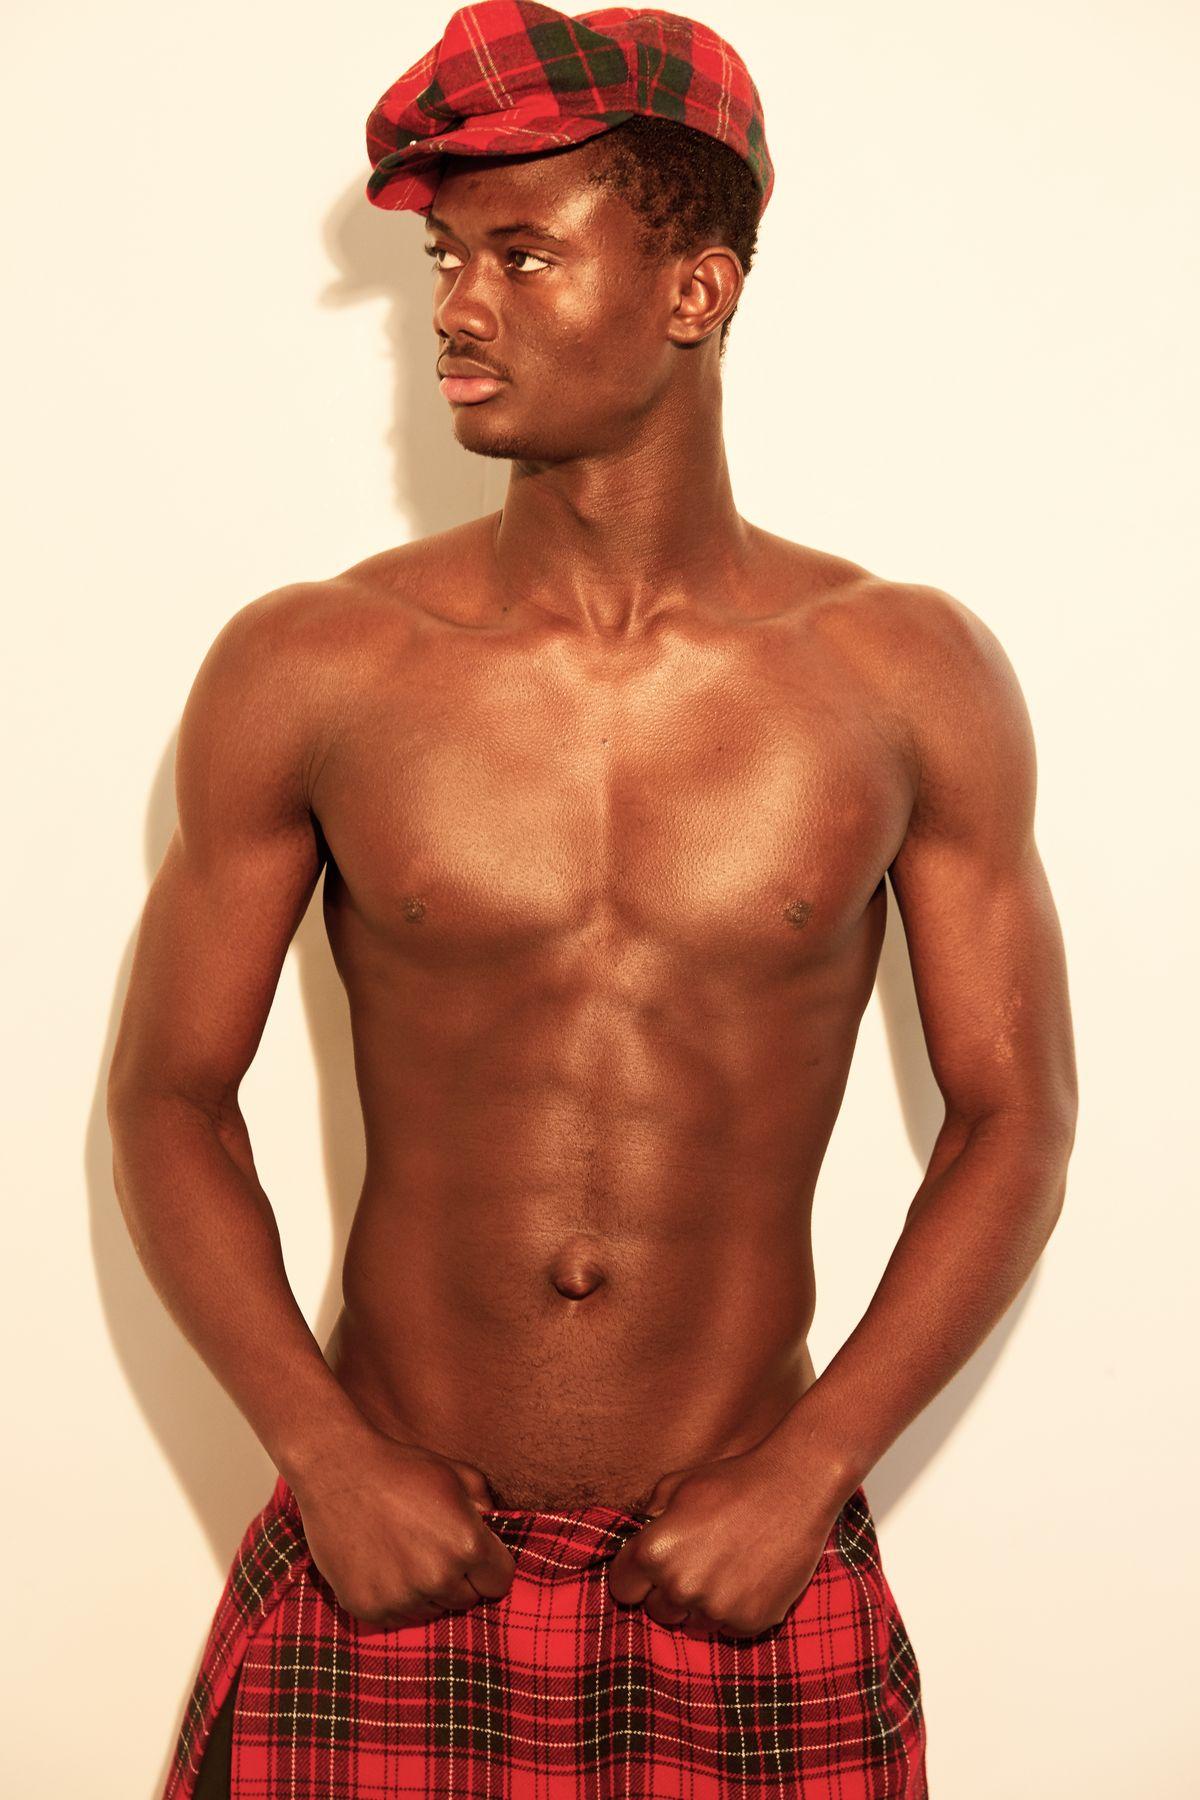 Model Yannick Sako